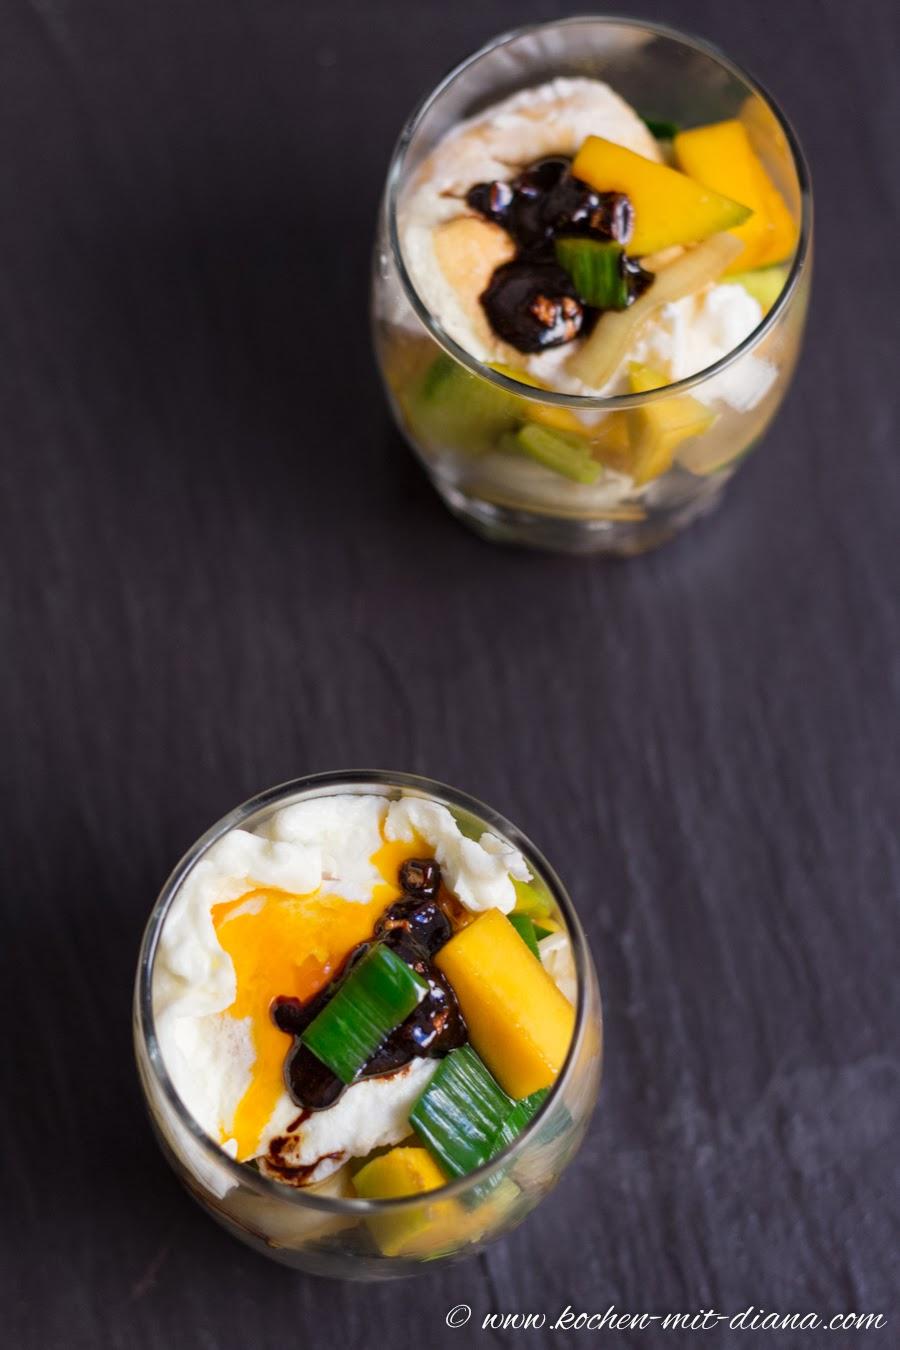 Mango-Lauch Salat im Glas